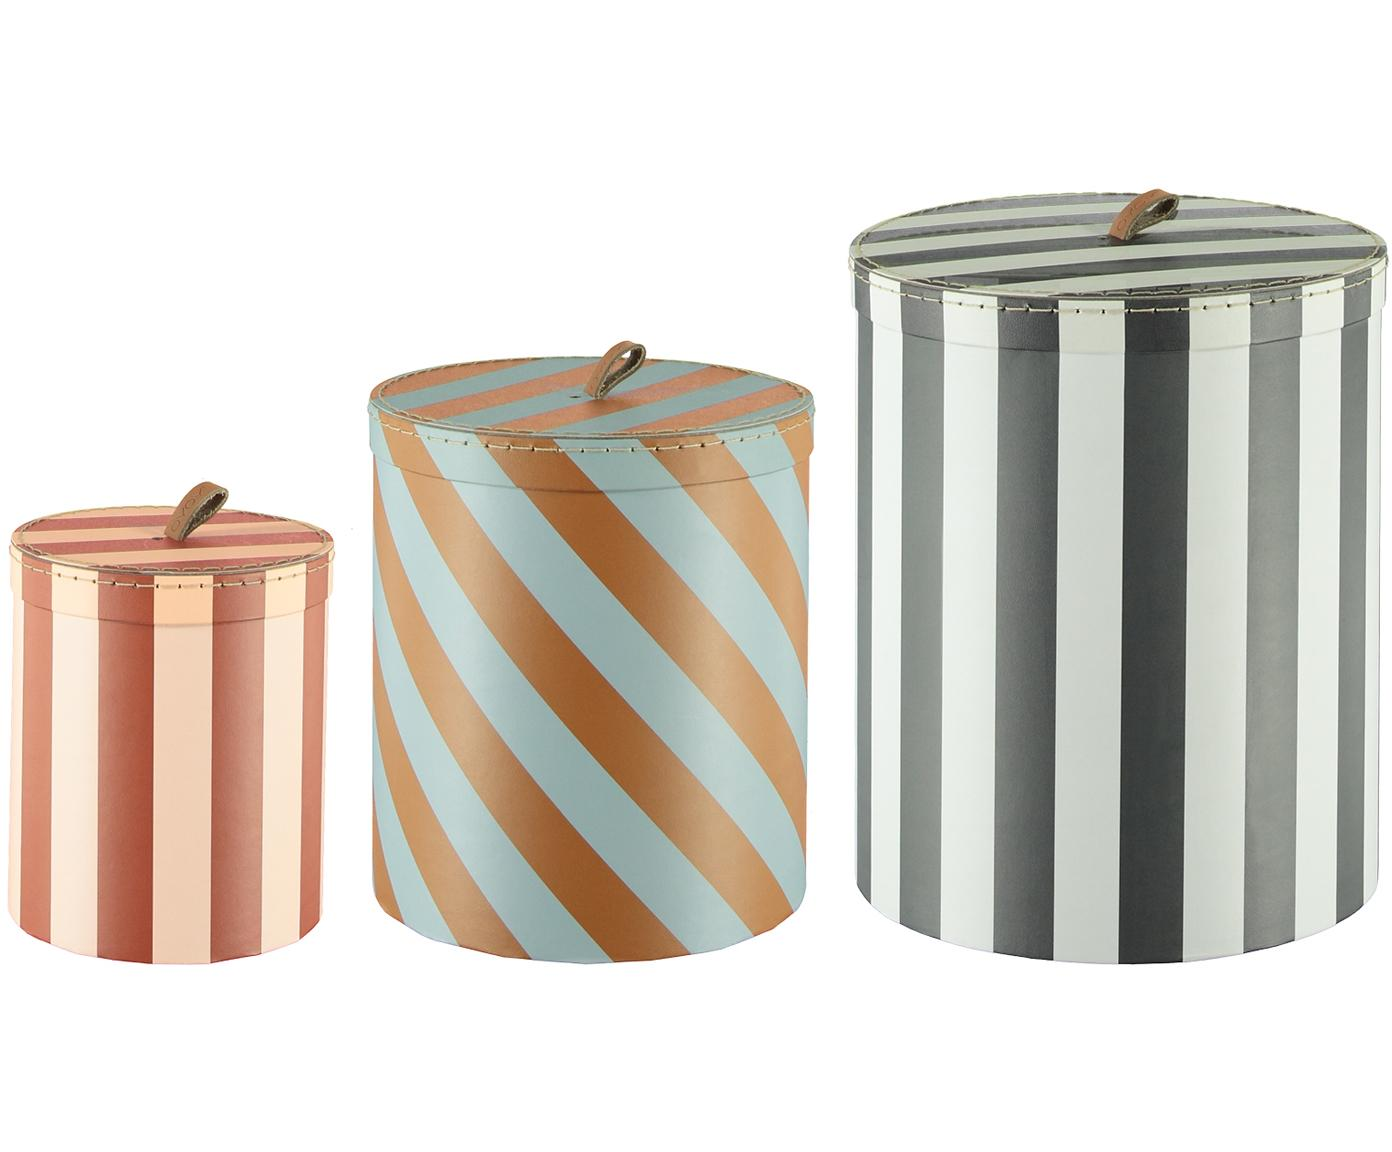 Aufbewahrungsbox Cecila, Karton, Leder, Blau, Braun, Ø 23 x H 26 cm